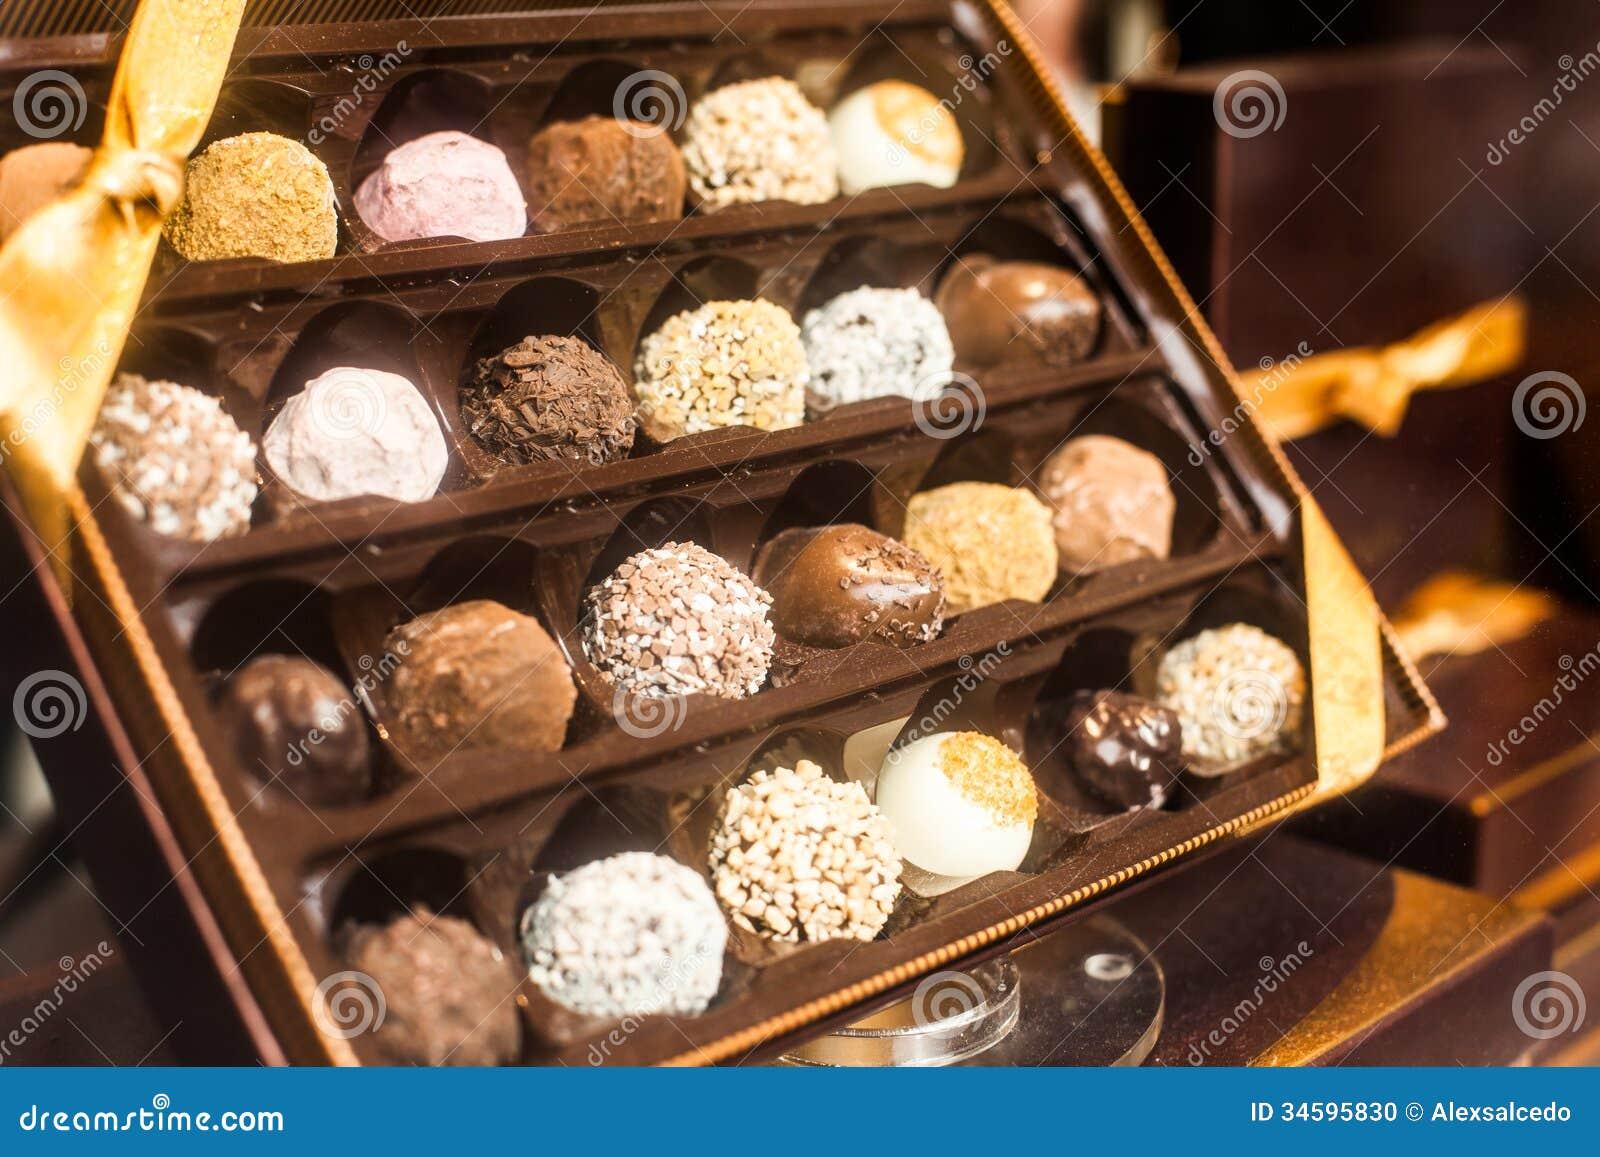 Belgium Chocolate Stock Photo - Image: 34595830